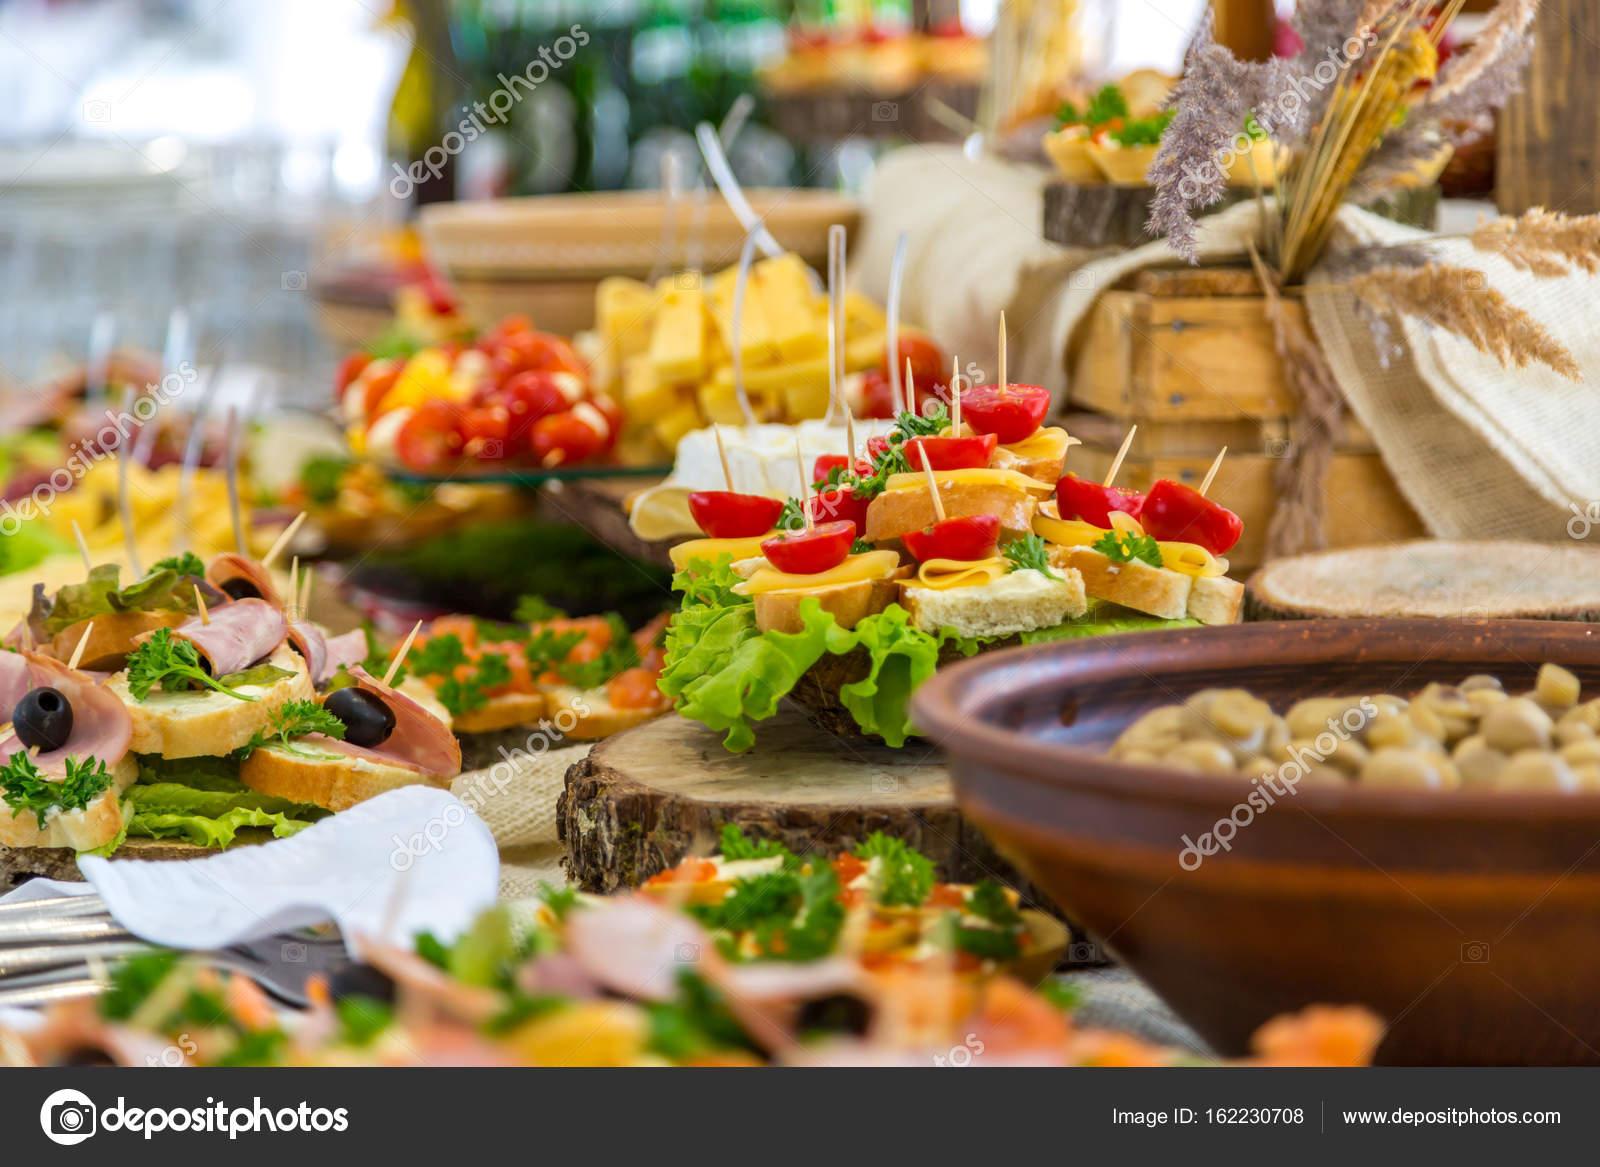 Mesa de banquete no restaurante servido com refei es for Mesas para negocio comidas rapidas